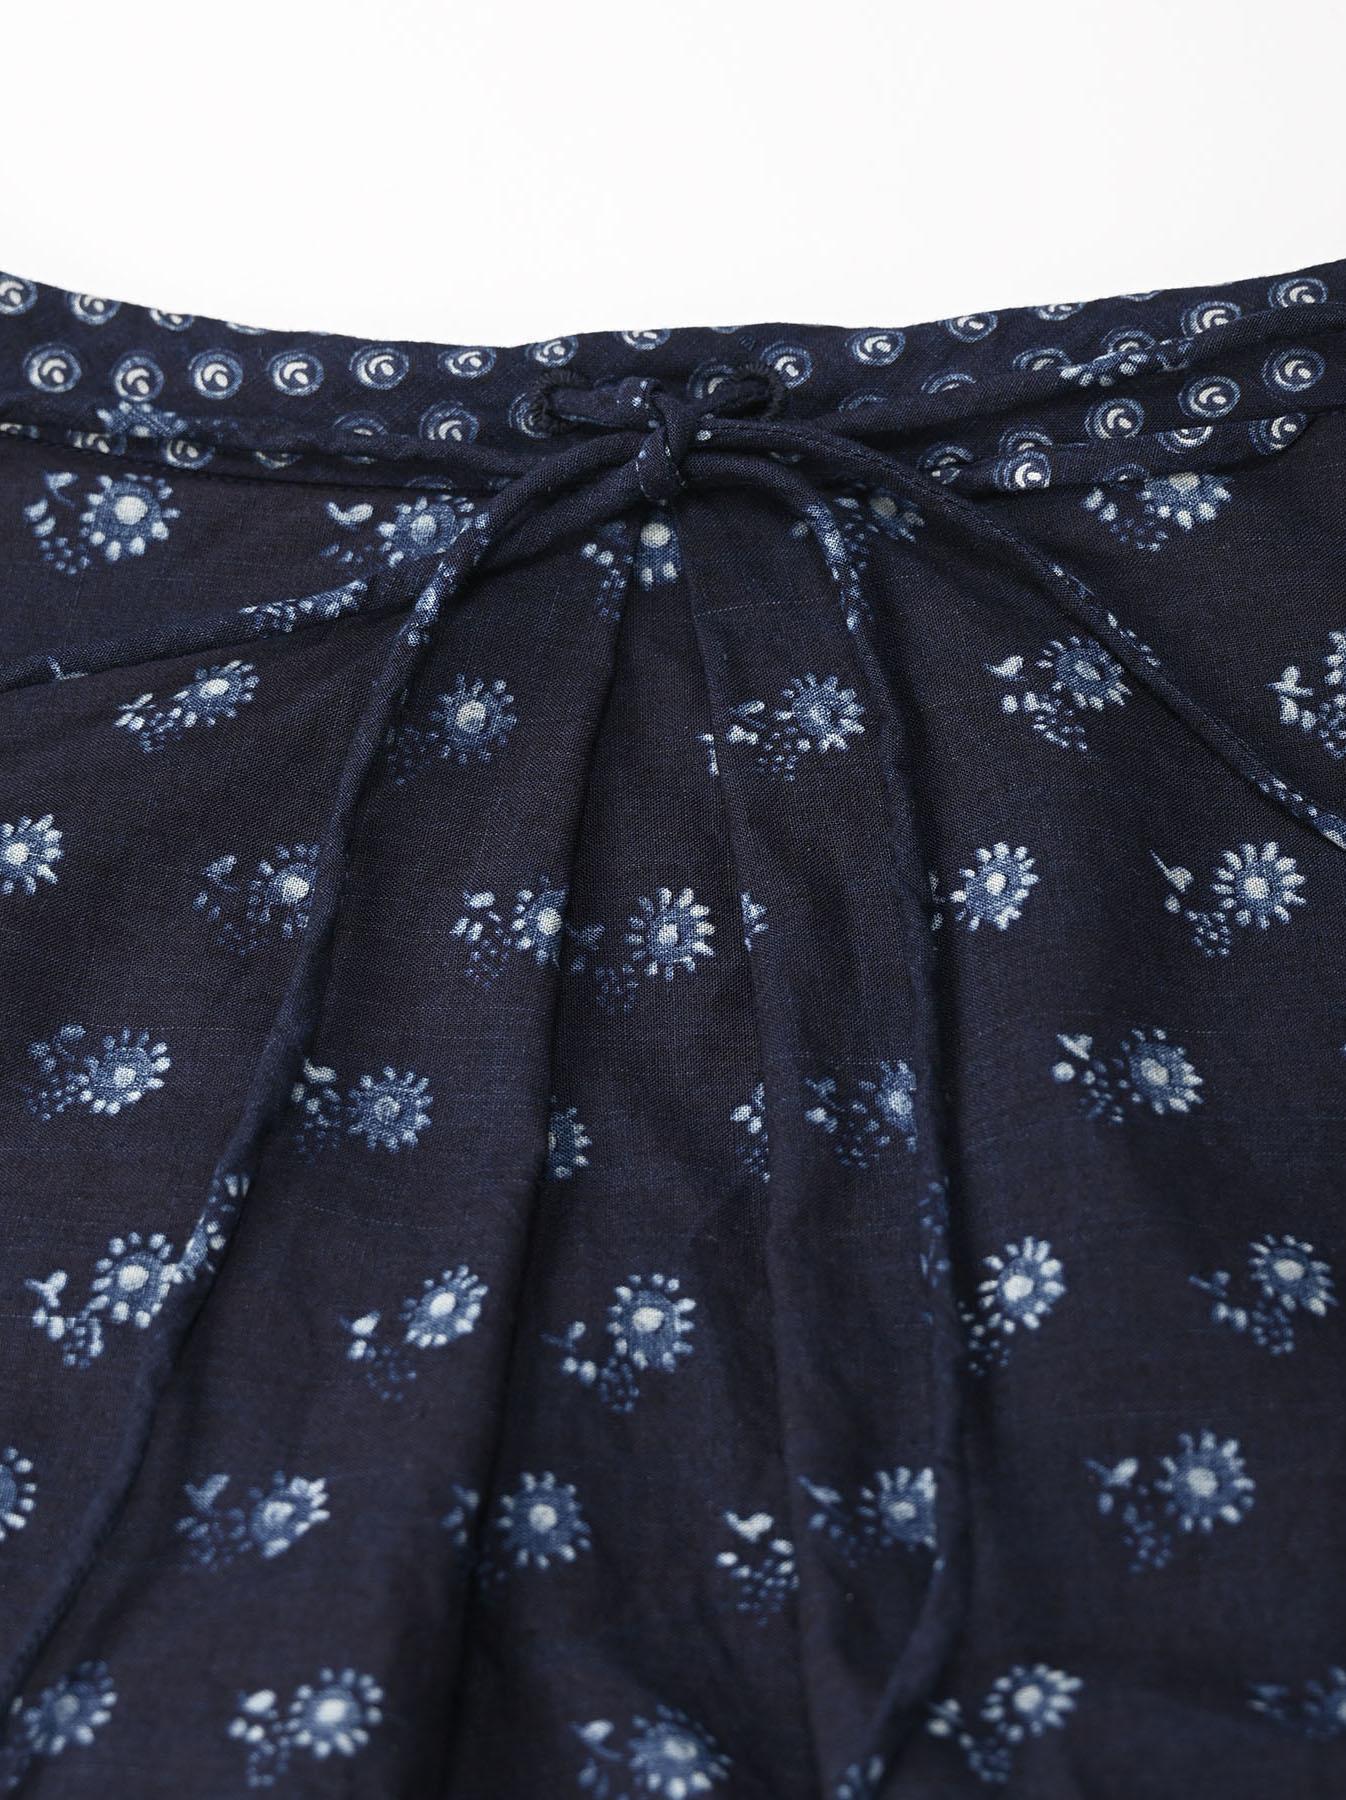 Indigo Tappet Flower Patchwork Dress-10